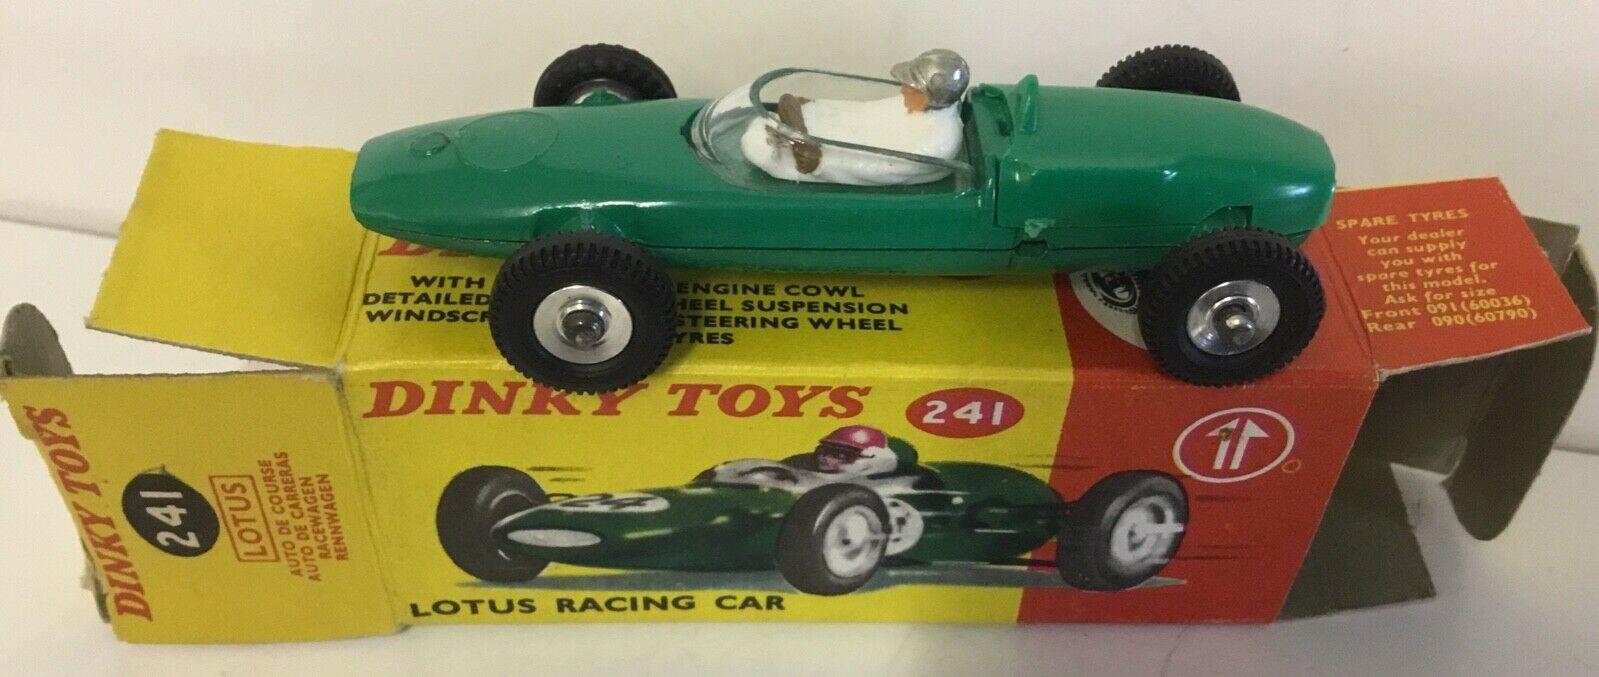 DINKY SpielzeugS 241 MasseUS RACING  CAR; NEAR MINT IN VERY GOOD BOX. RARE Silber HELMET